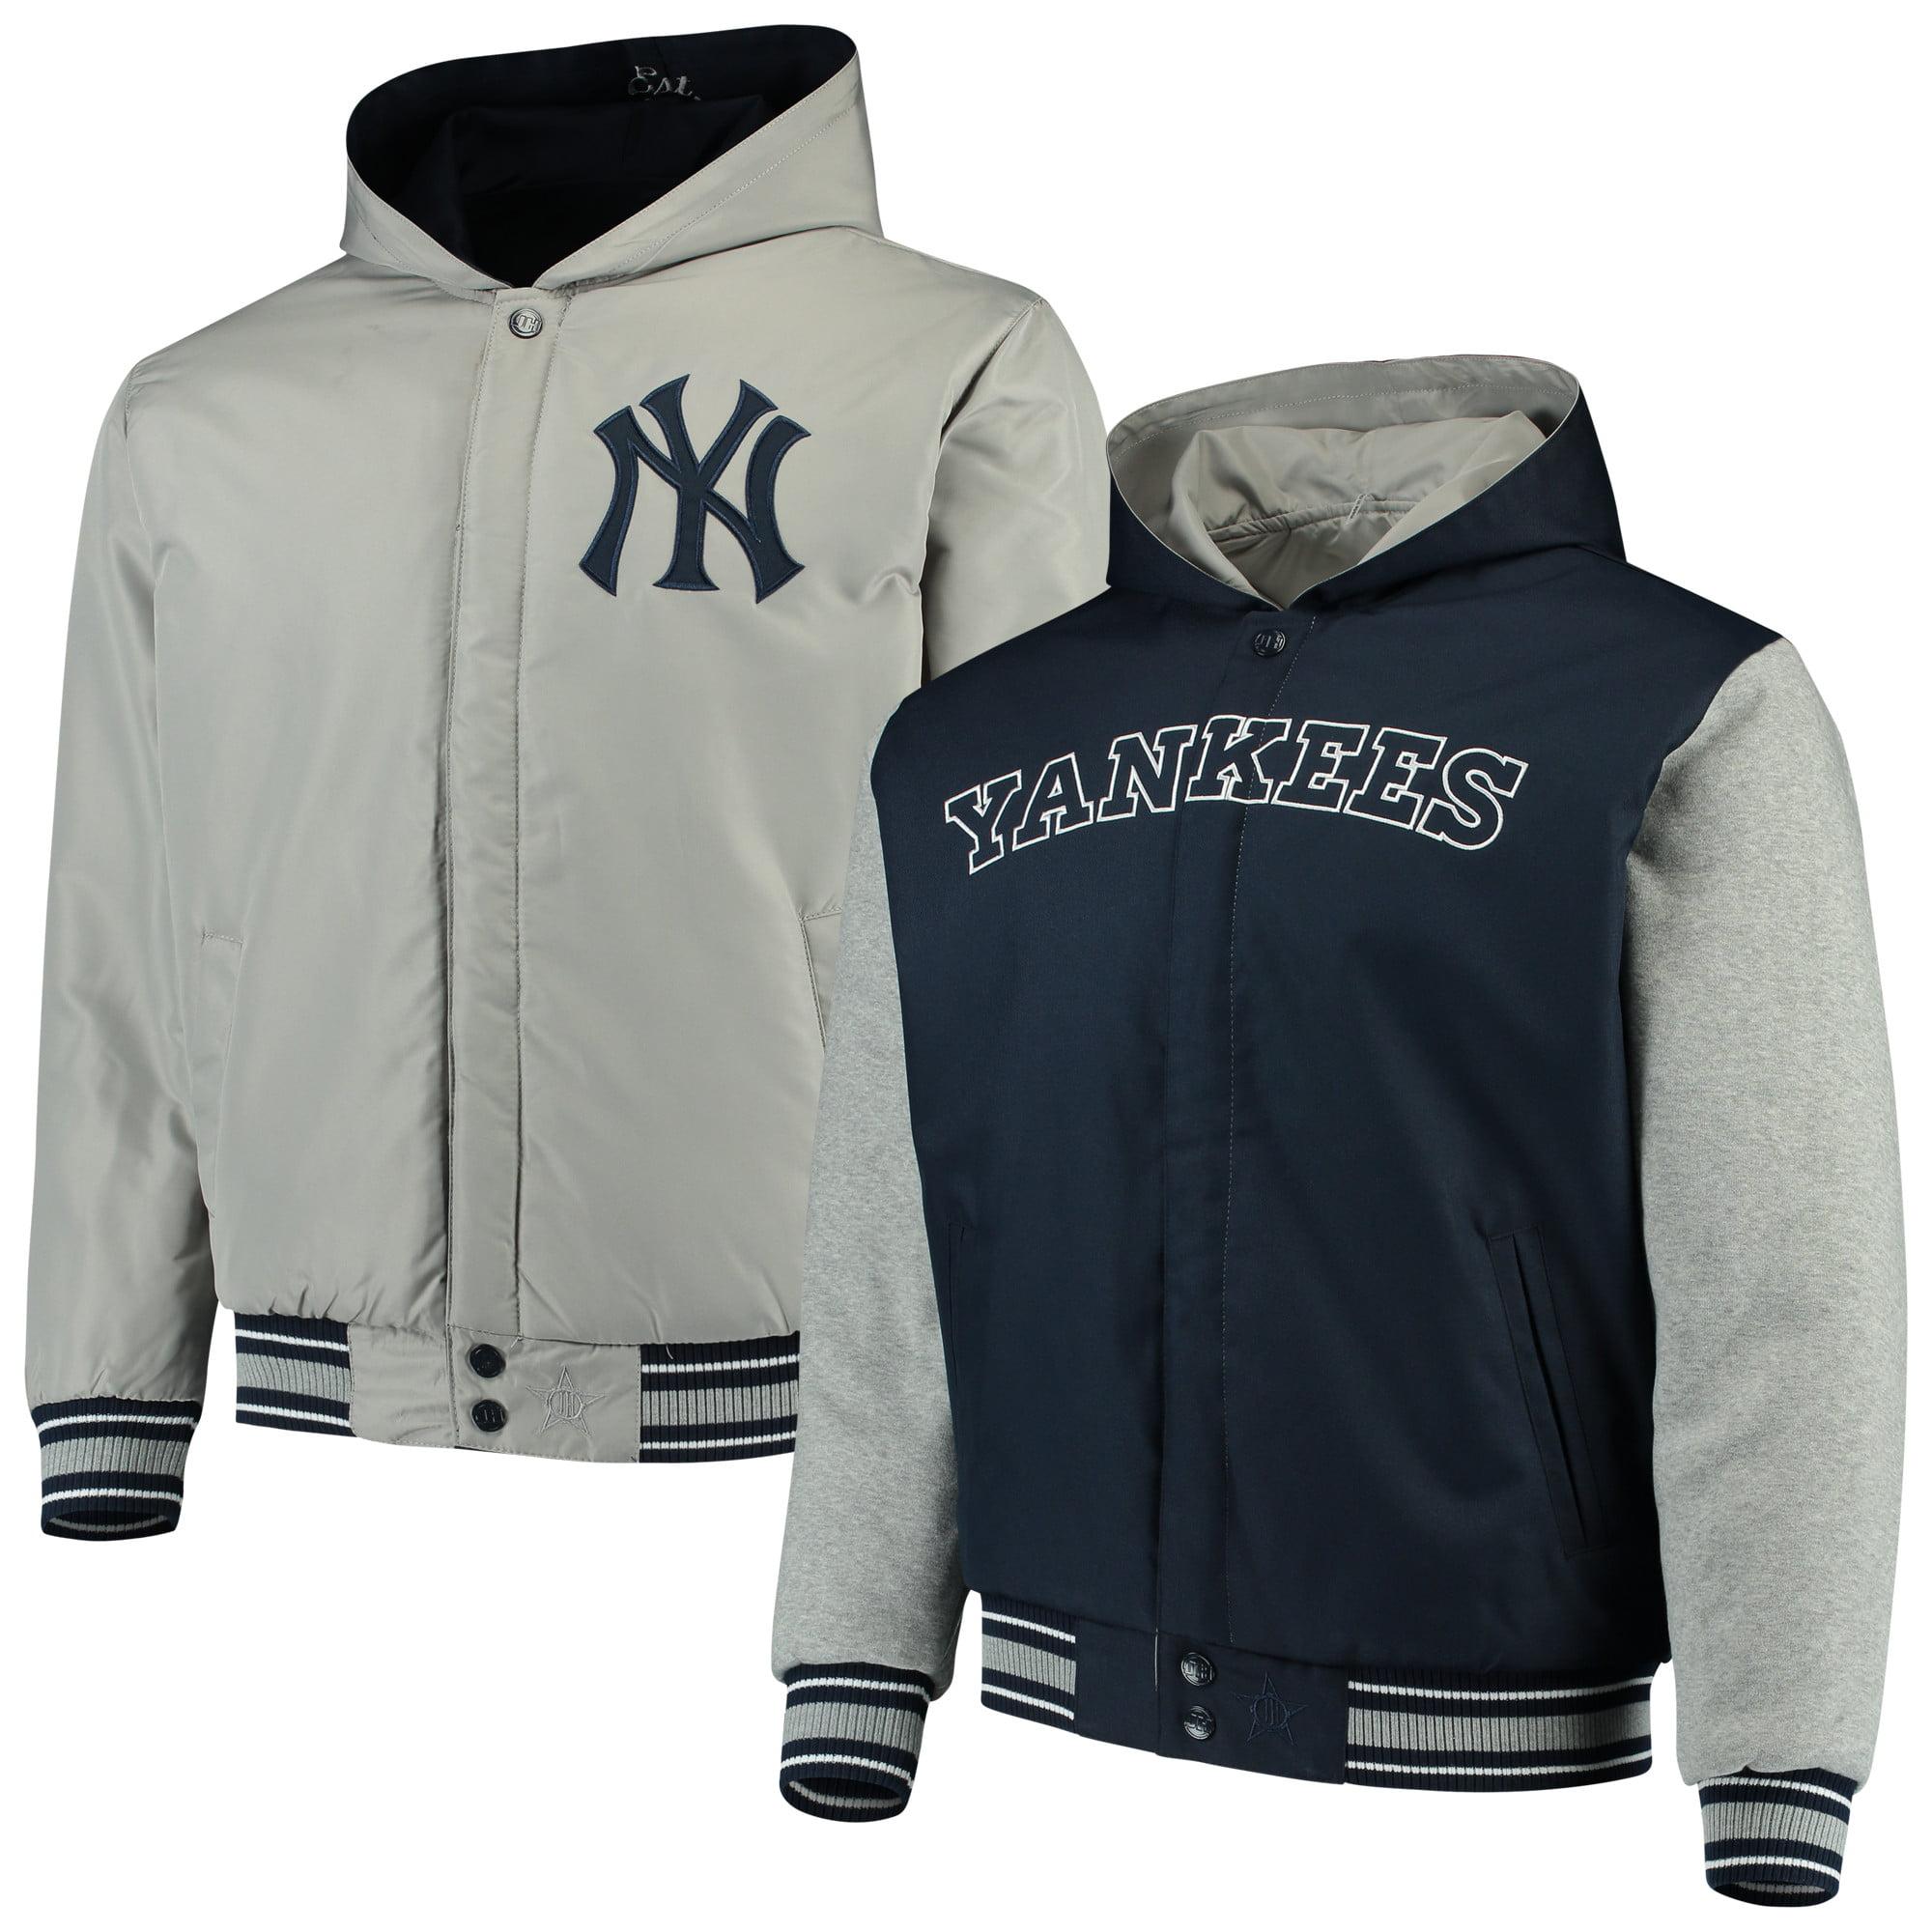 New York Yankees JH Design Reversible Full-Snap Twill Jacket - Navy/Gray